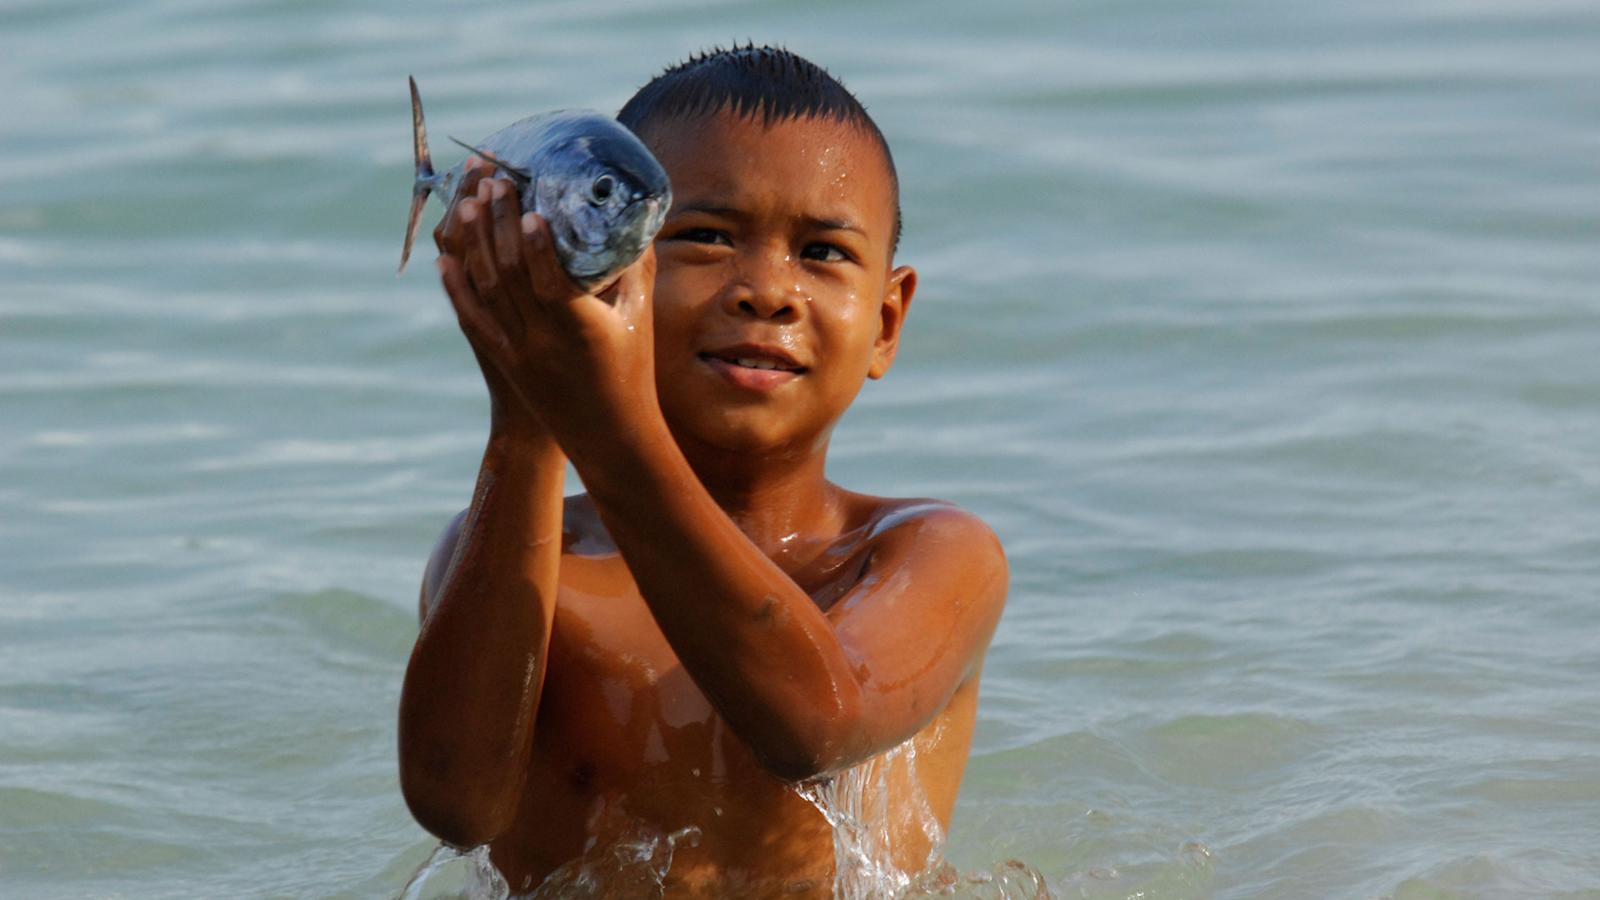 BKT7JB young sea gypsy boy holding fish, chao leh, sea gypsy village , rawai beach , phuket island ,thailand